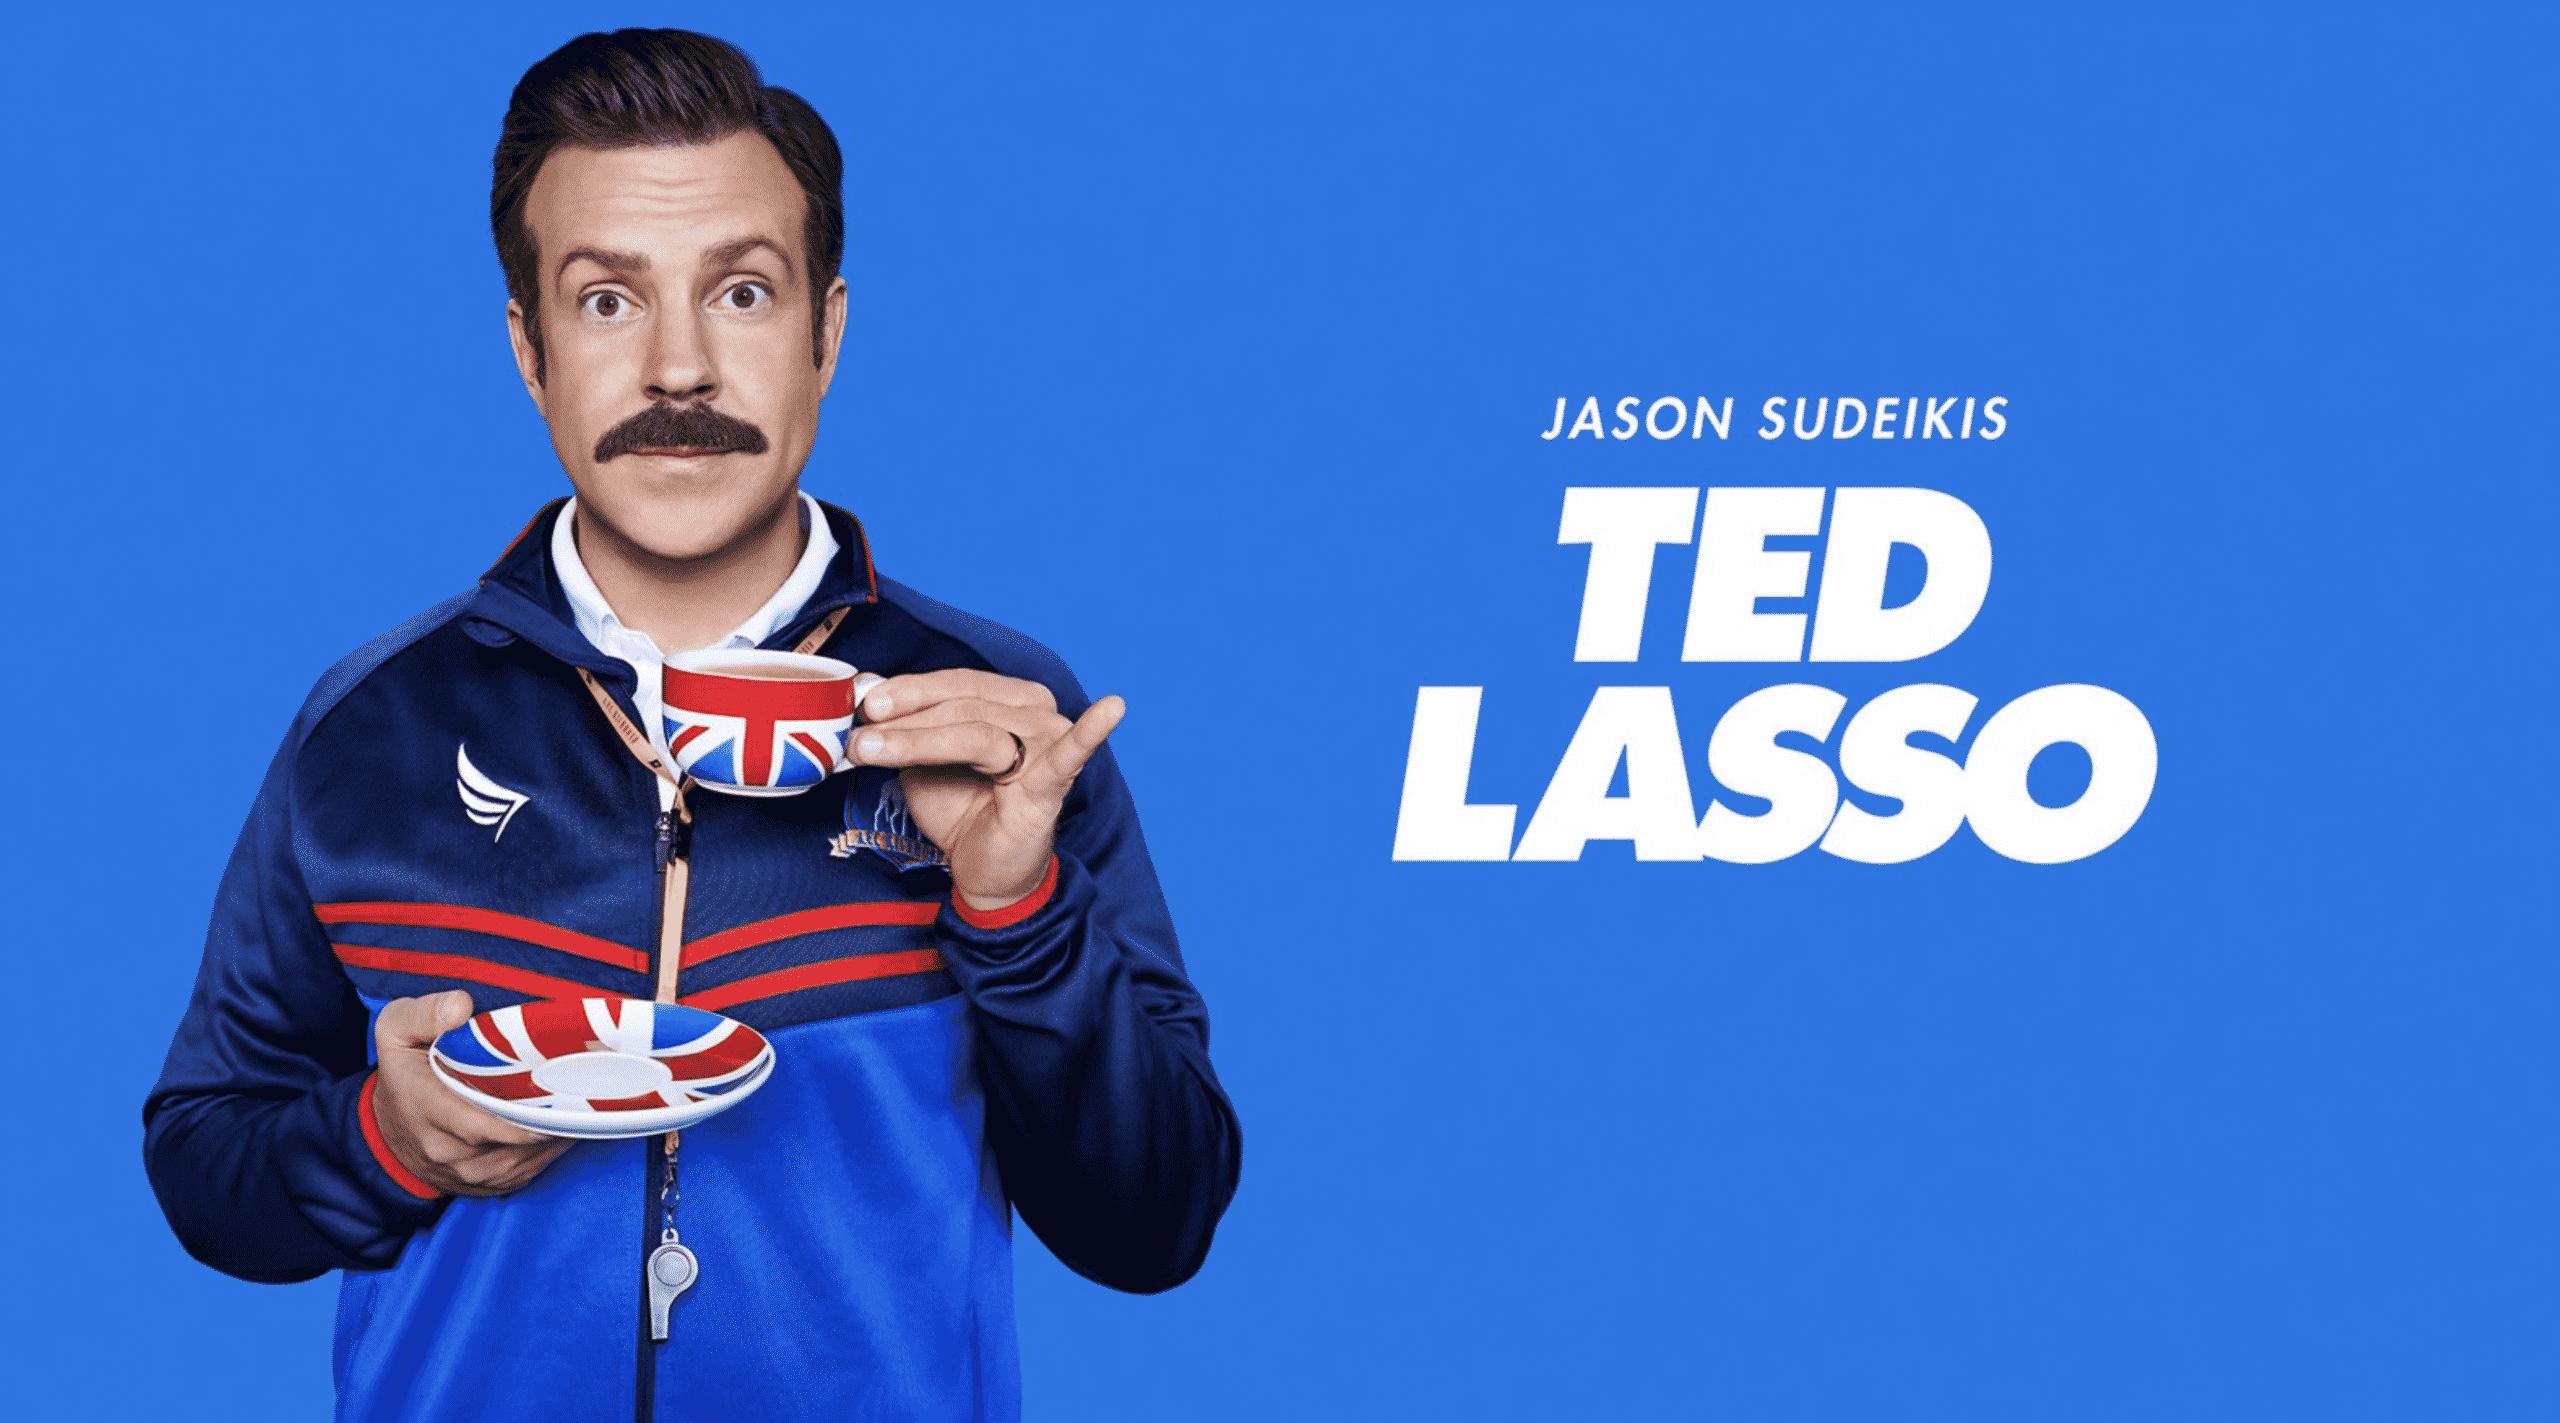 Ted Lasso season 3